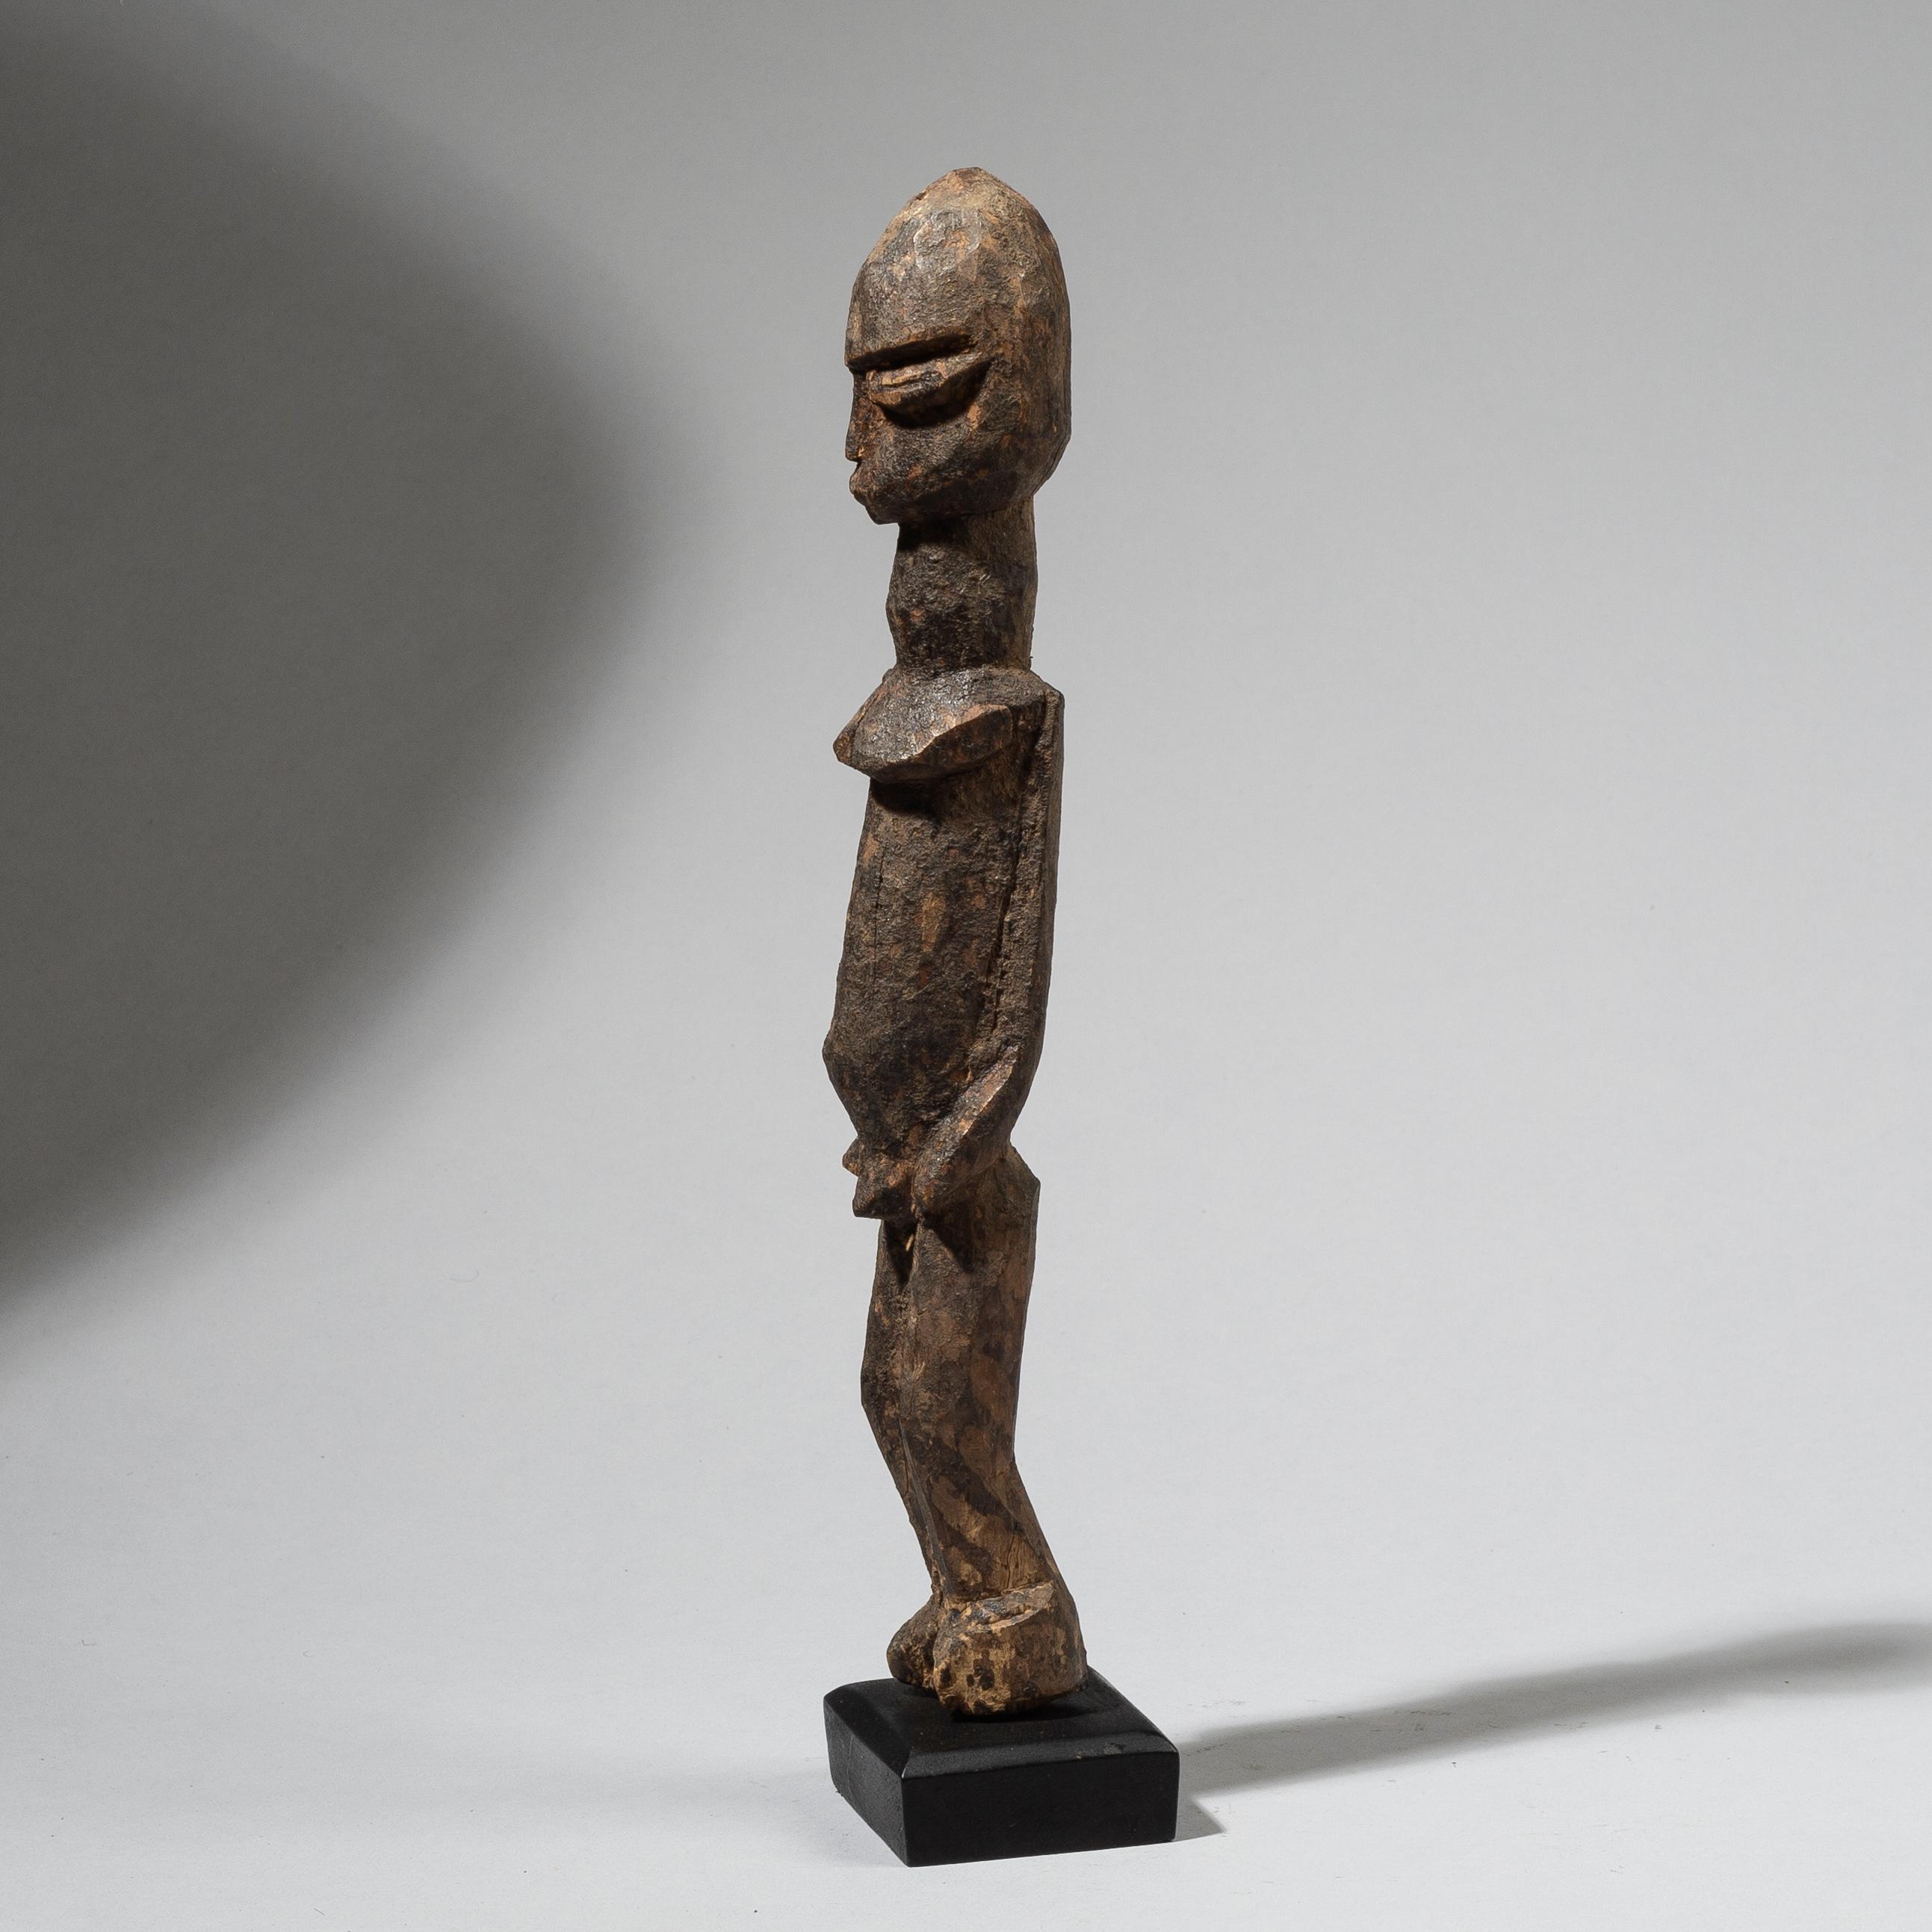 AN ELONGATED, ENCRUSTED LOBI THIL FIGURE, BURKINA FASO W. AFRICA ( No 4426 )